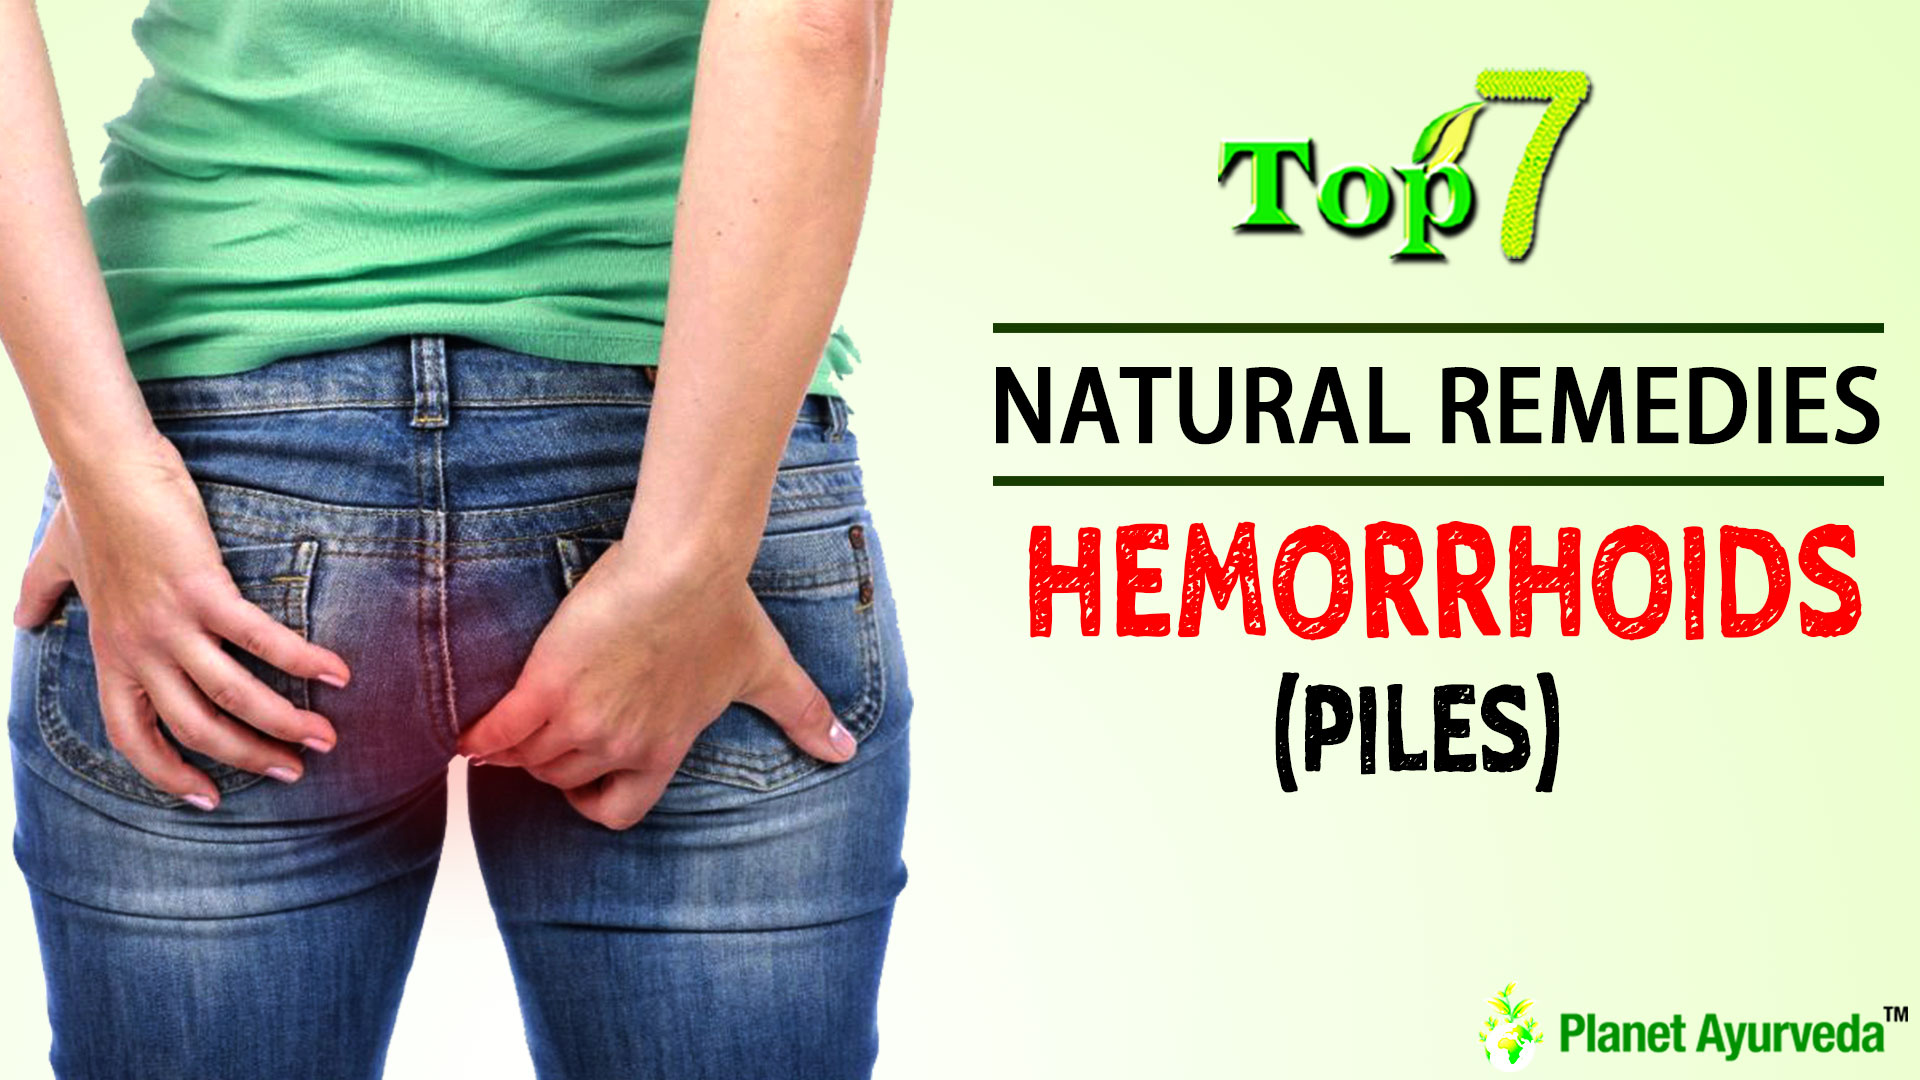 TOP 7 NATURAL REMEDIES FOR HEMORRHOIDS